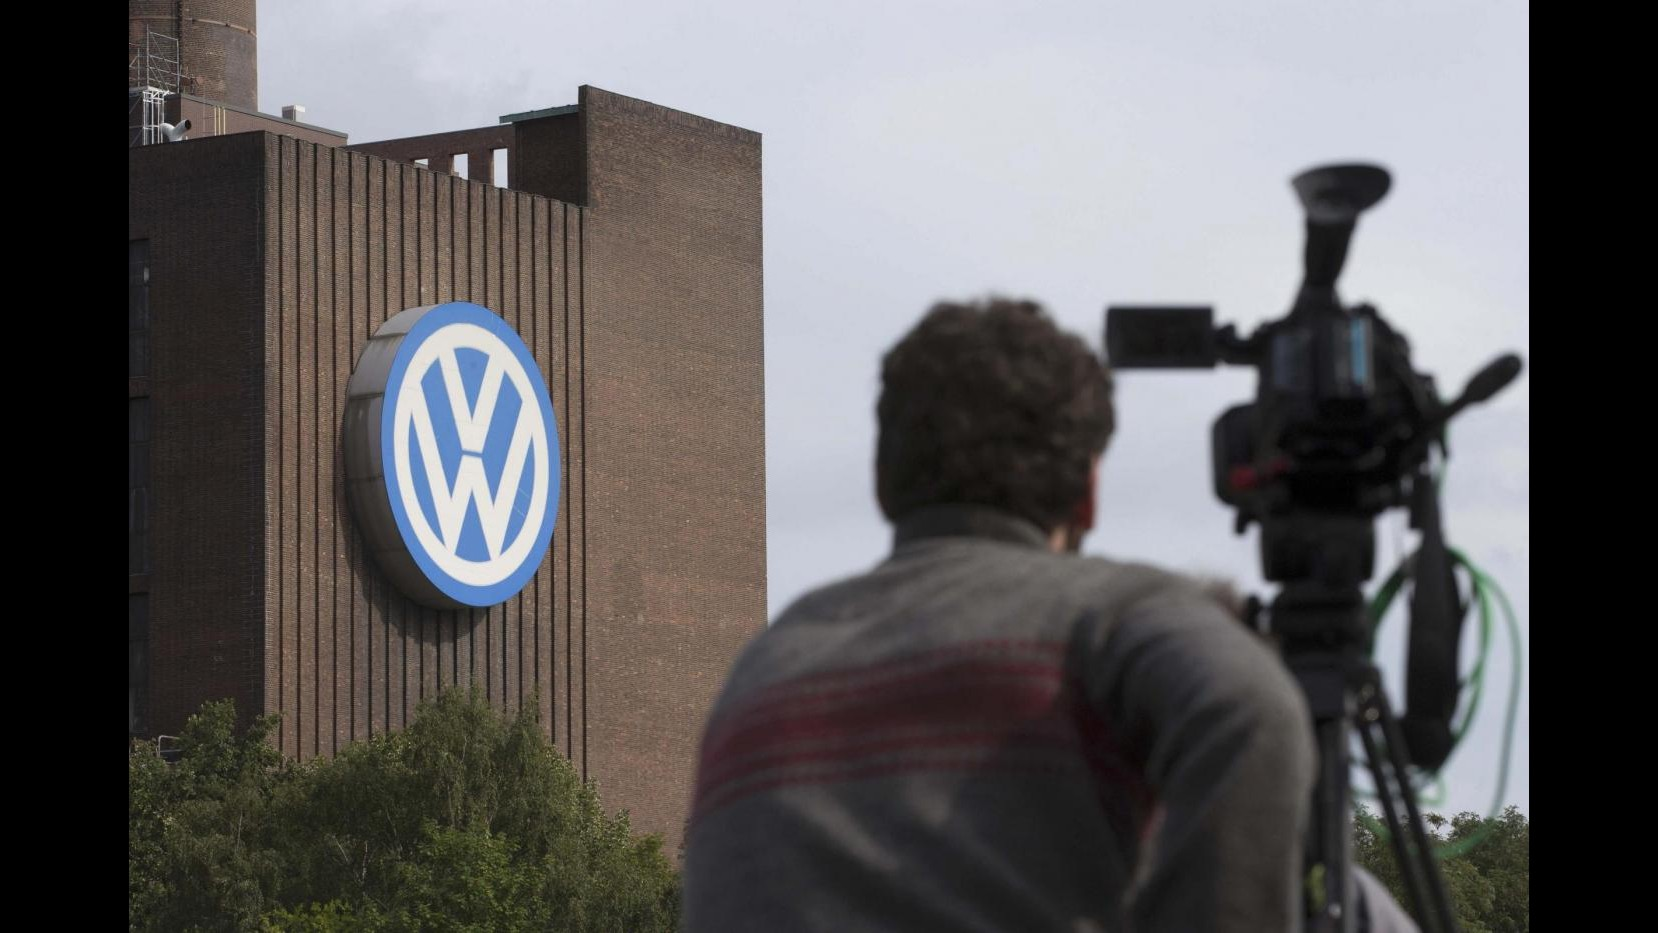 Volkswagen, Huber: Scandalo diesel è disastro morale e politico